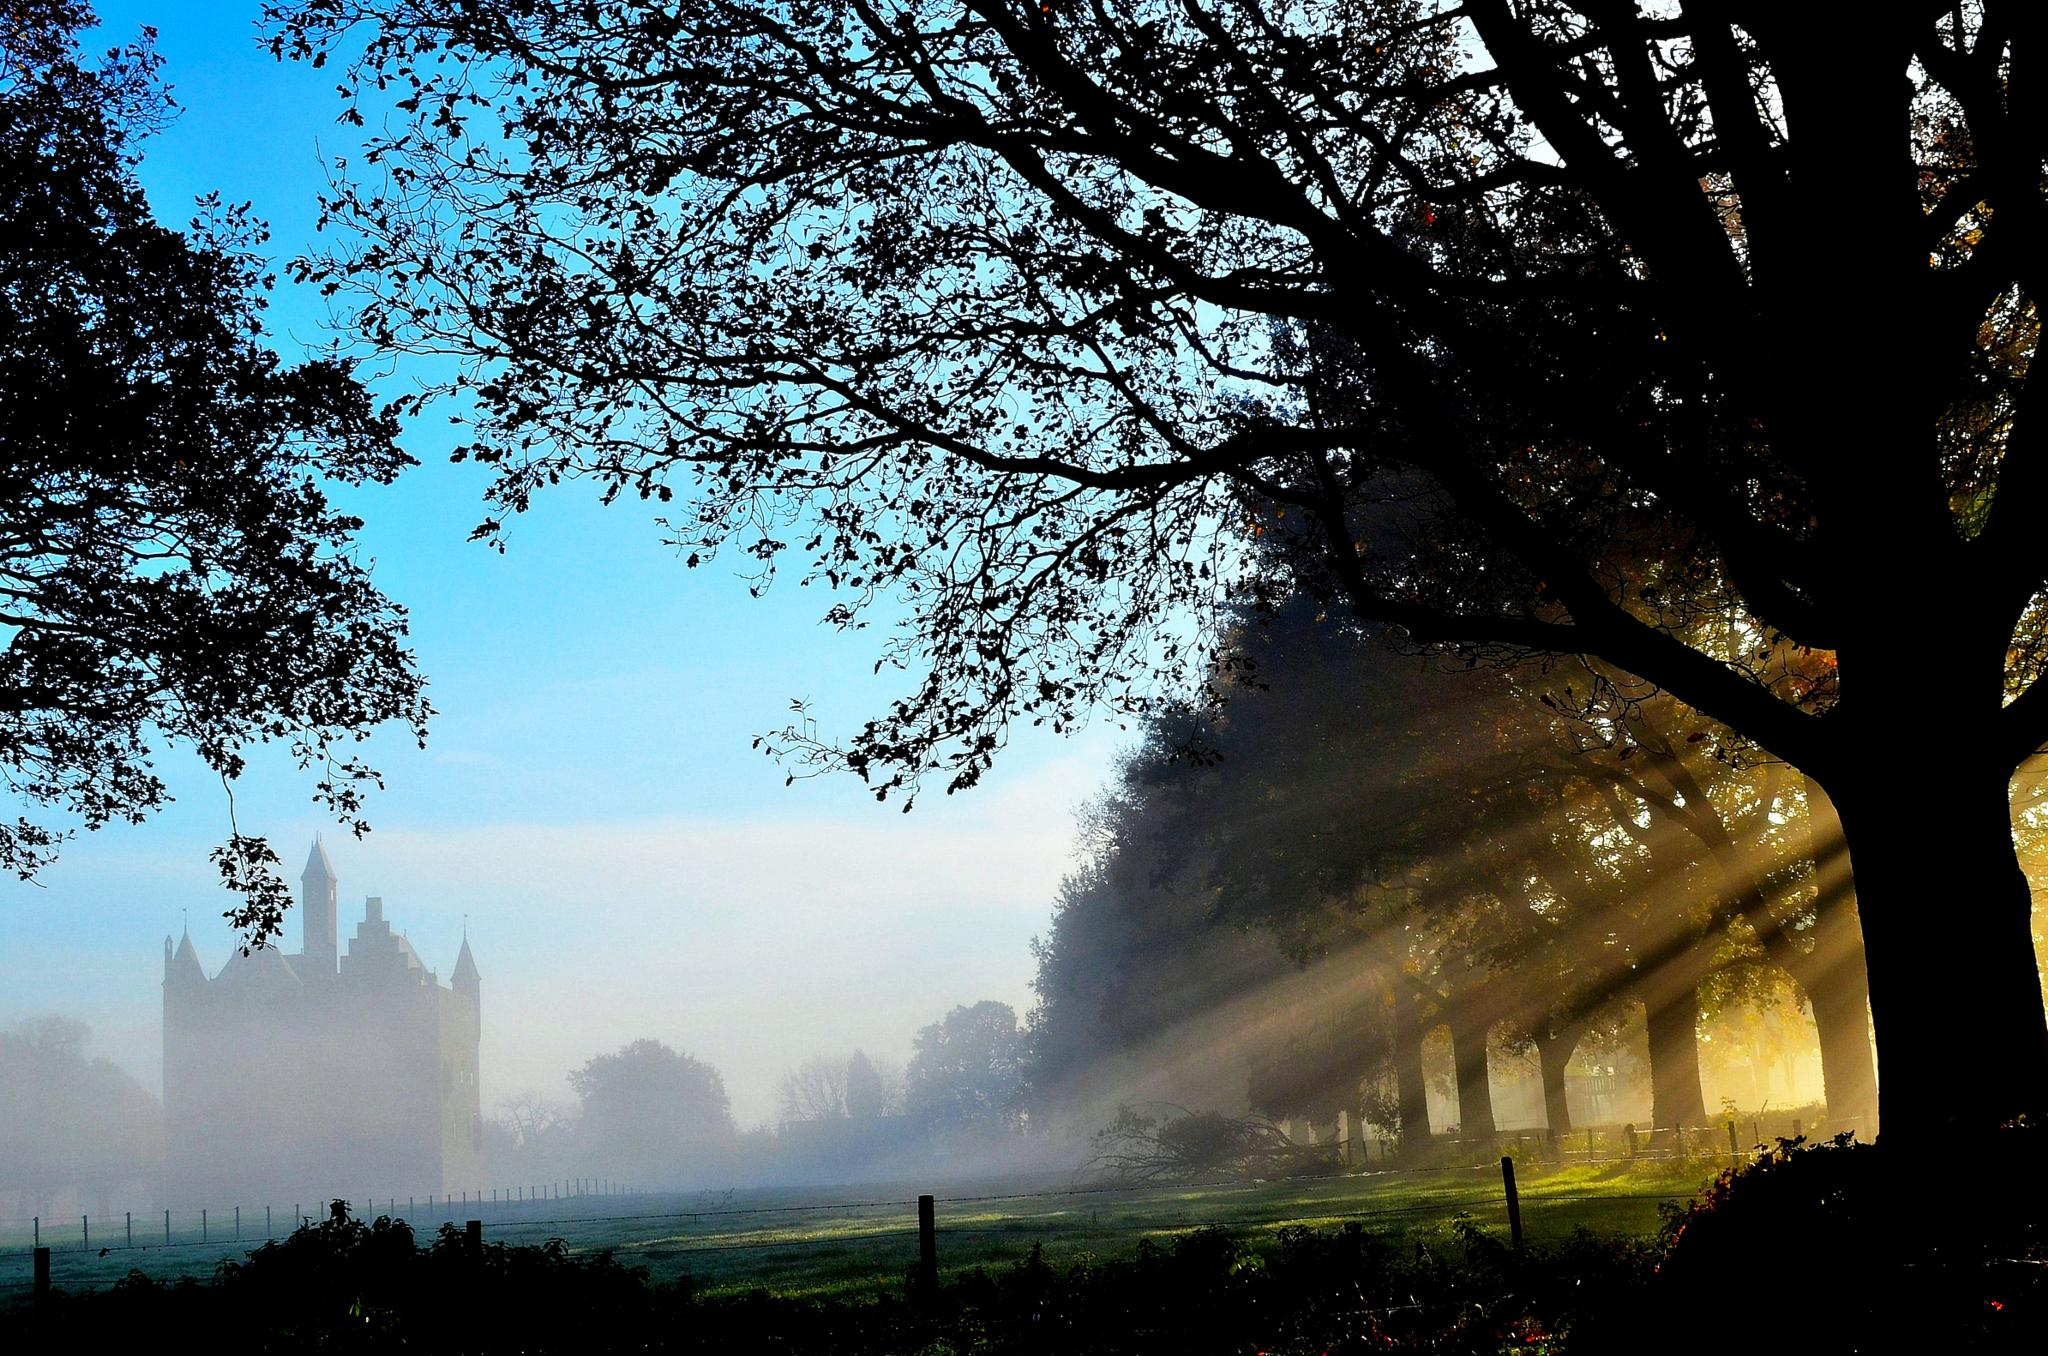 Goodmorning sunshine by Joyce Derksen